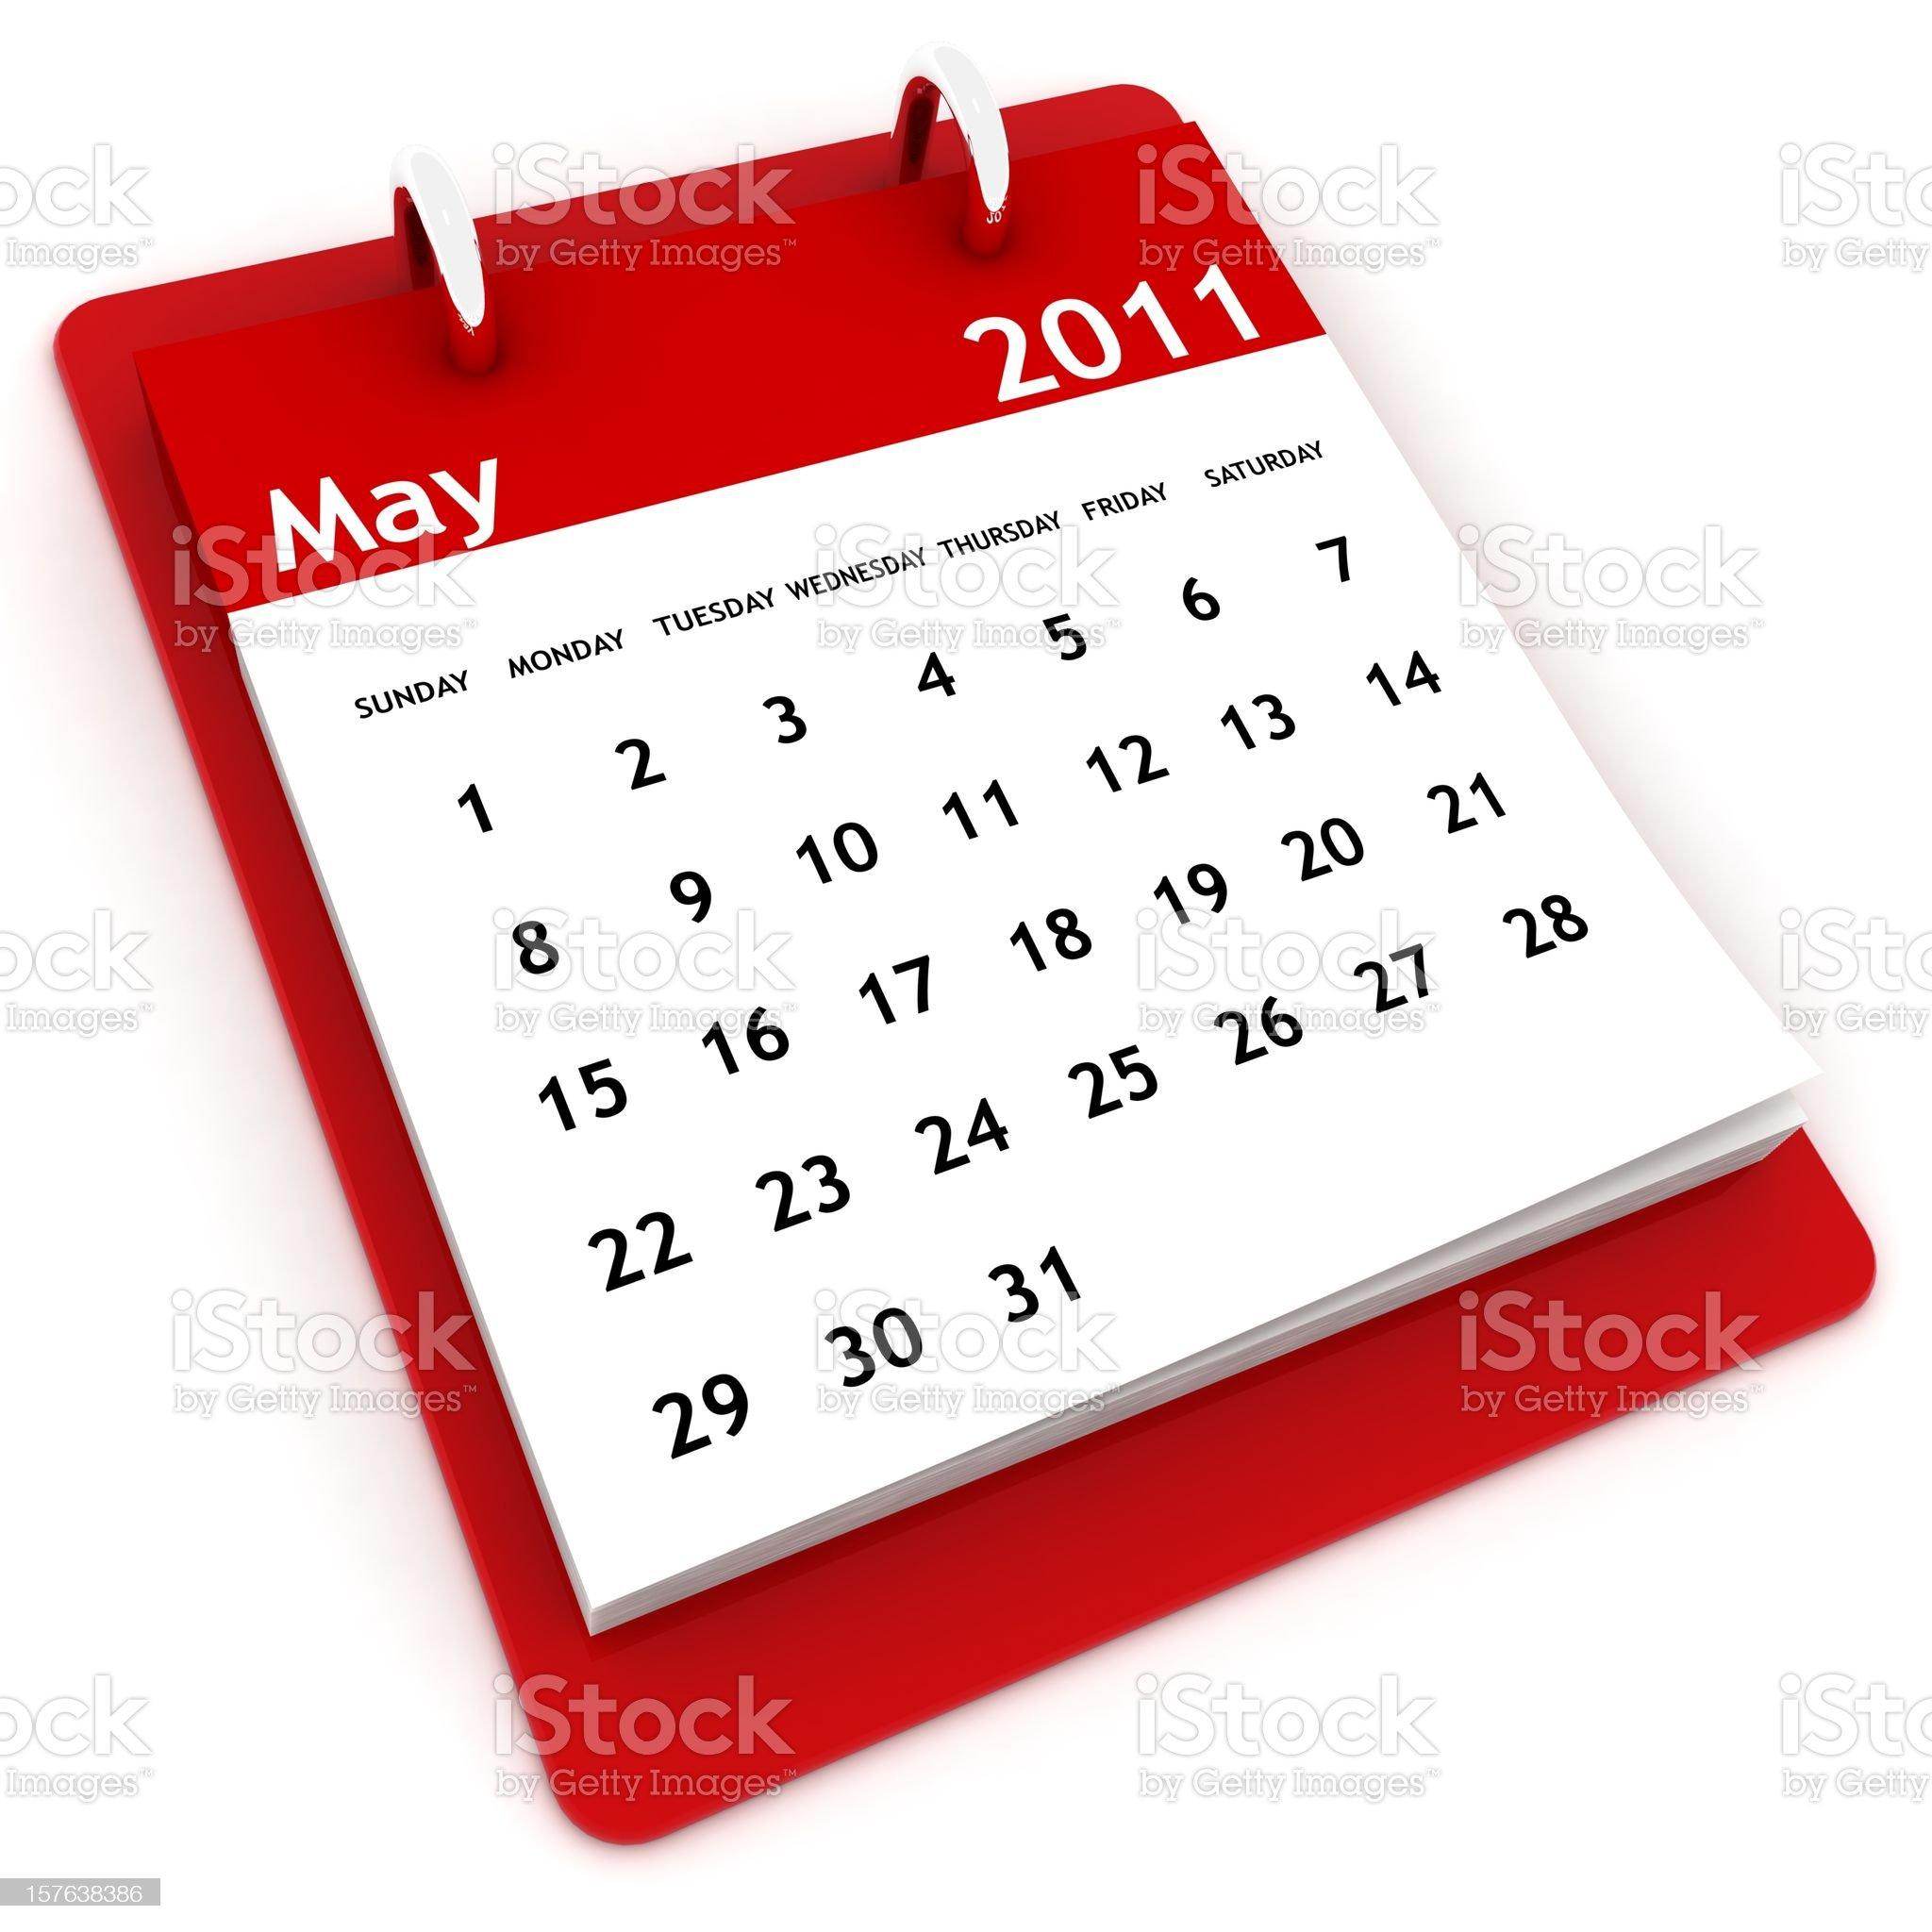 May 2011 - Calendar series royalty-free stock photo